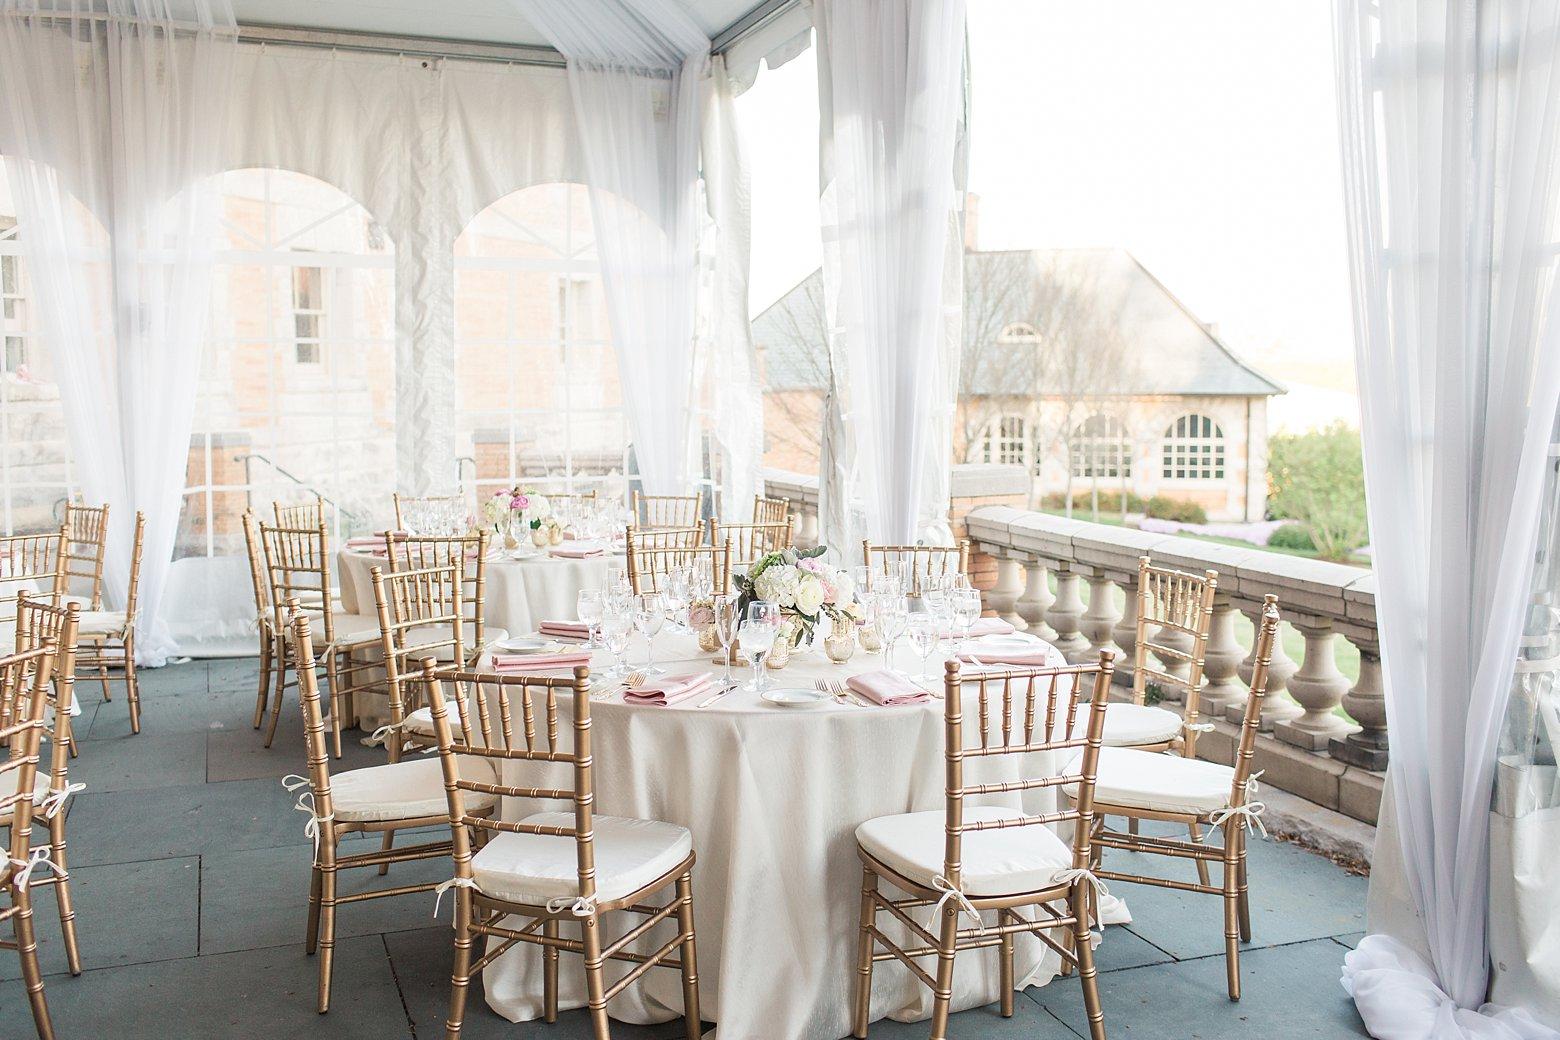 lauren_fair_photography_april_lynn_designs_stasia_matt_spring_cairnwood_estate_wedding_northeast_philadelphia_blush_pink_gold_wedding_invitation_stationery_0152